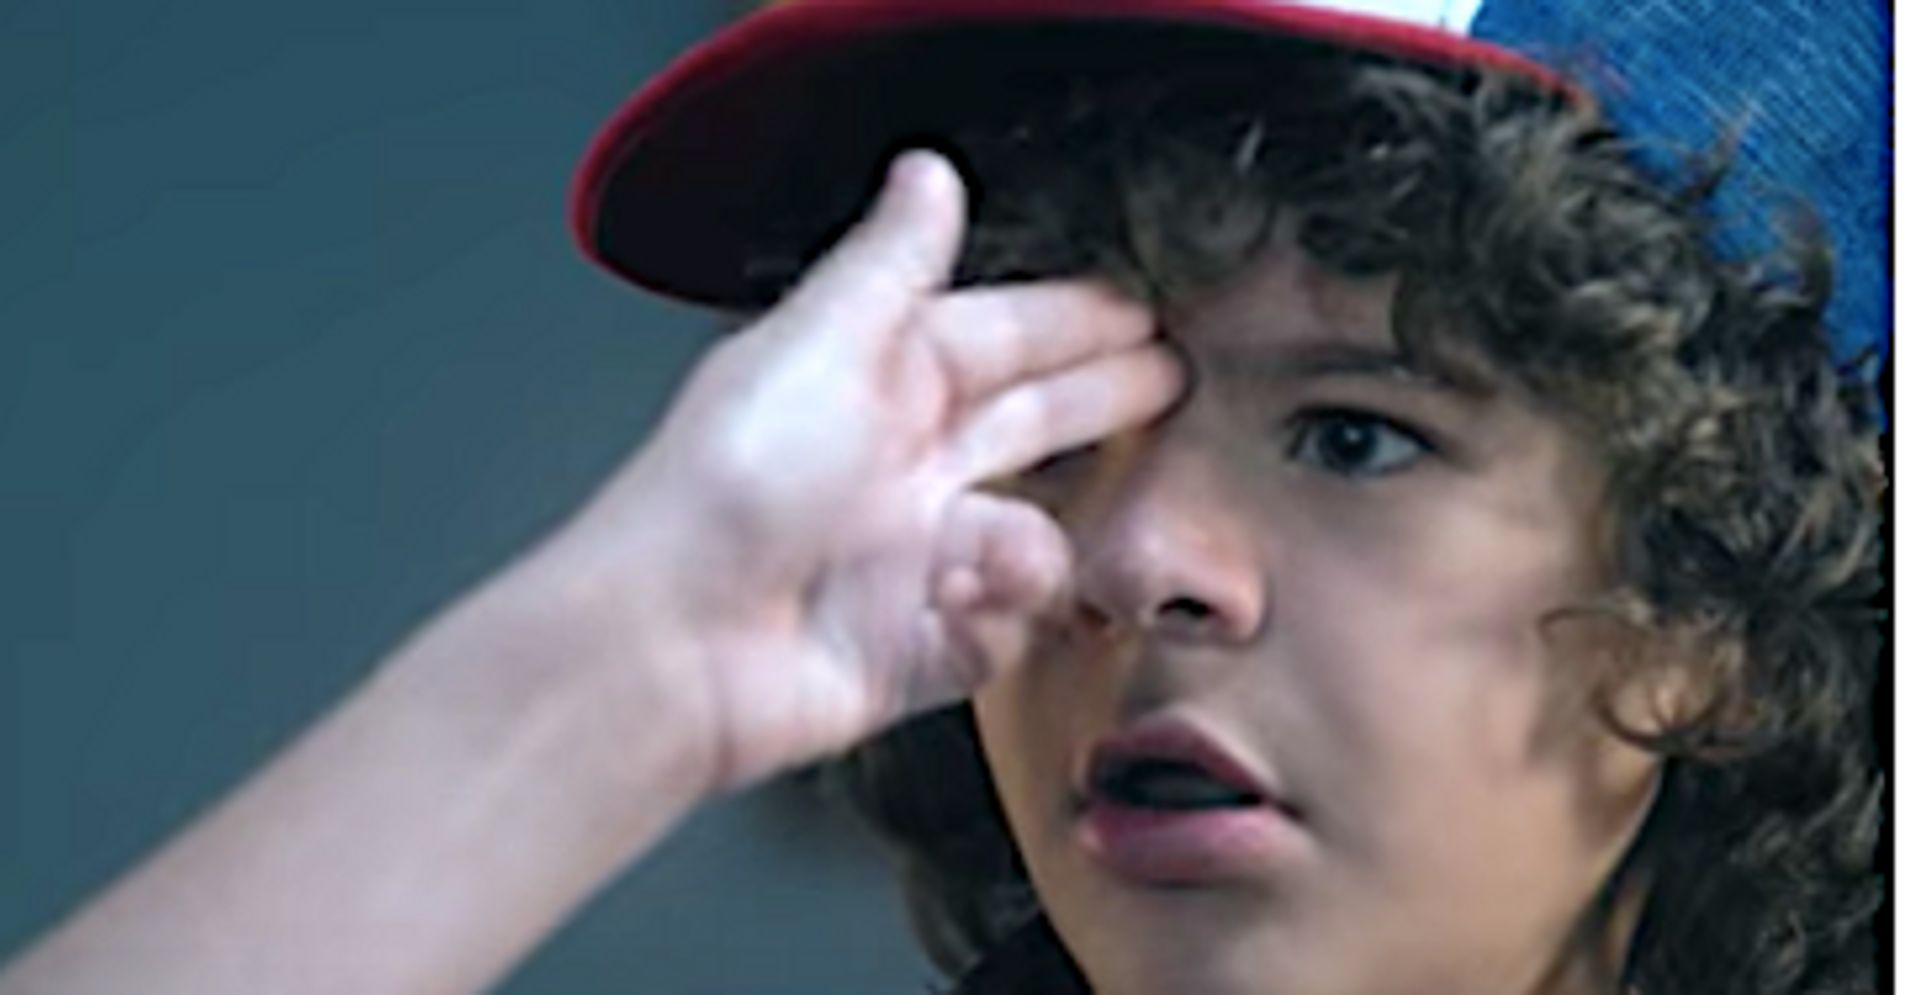 Bad Lip Reading Of 'Stranger Things' Is Freakin' Hilarious